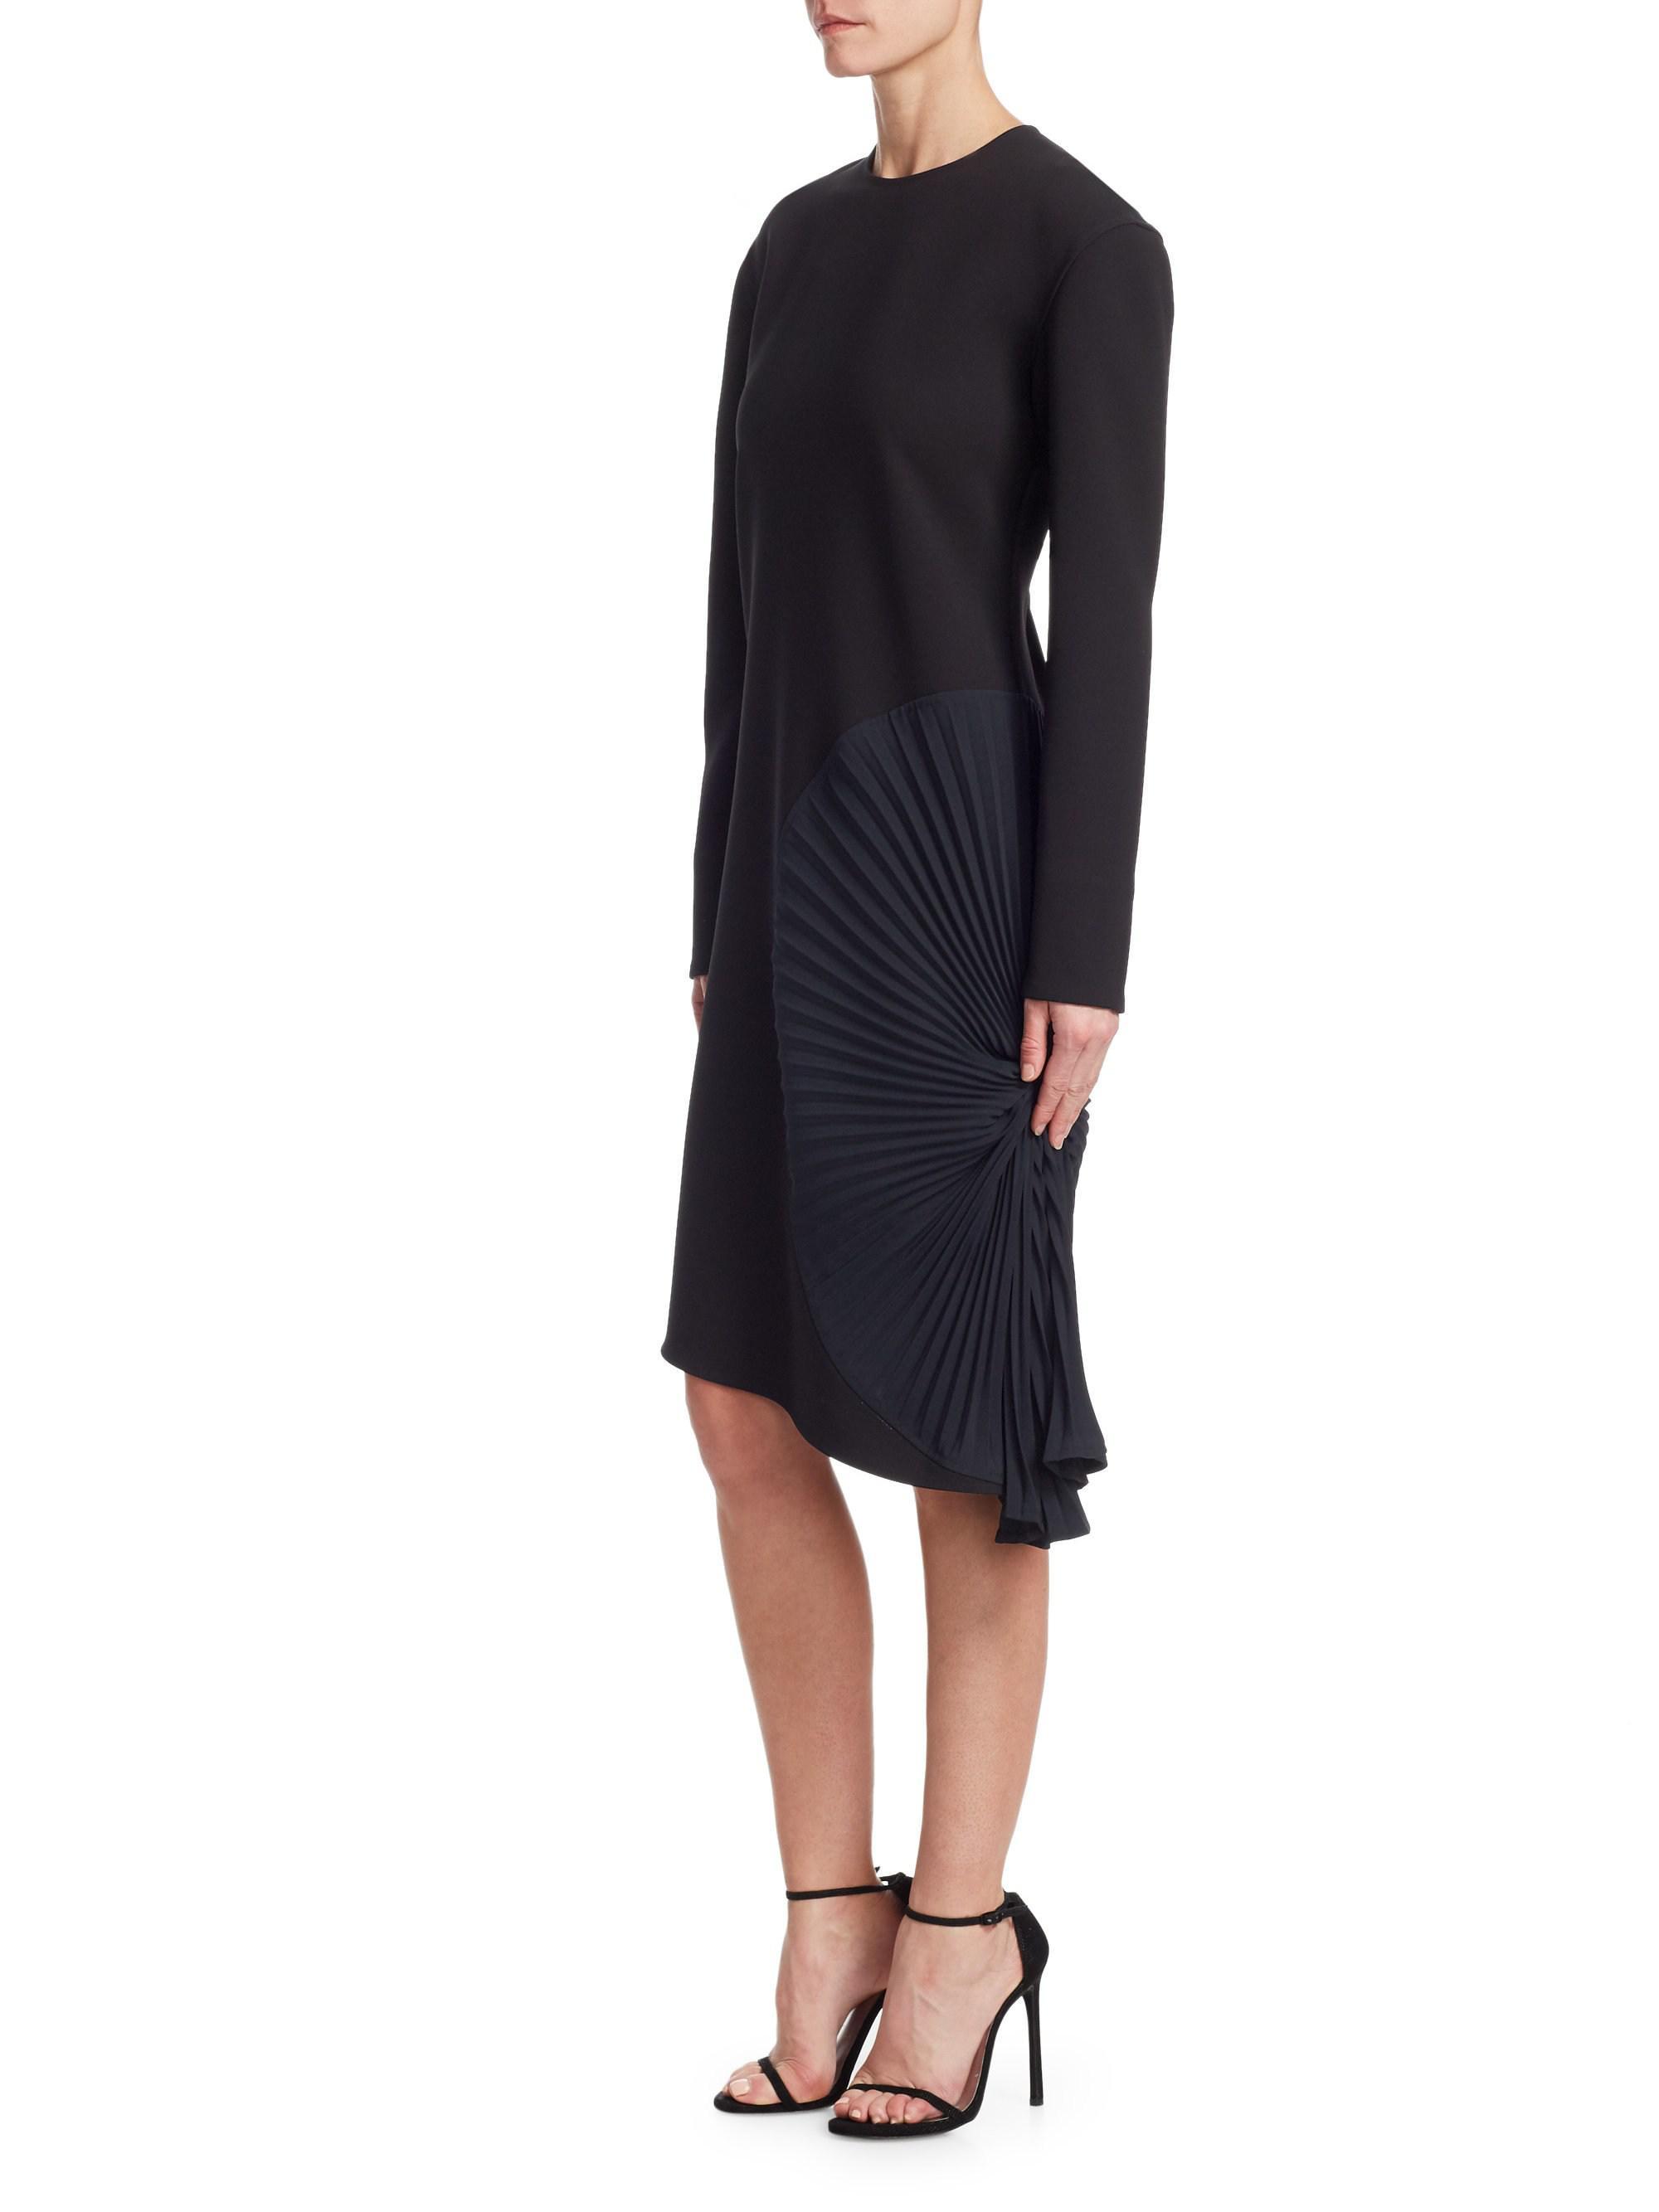 07ad1a4b0430 victoria-beckham-black-Long-Sleeve-Pleated-Panel-Dress.jpeg